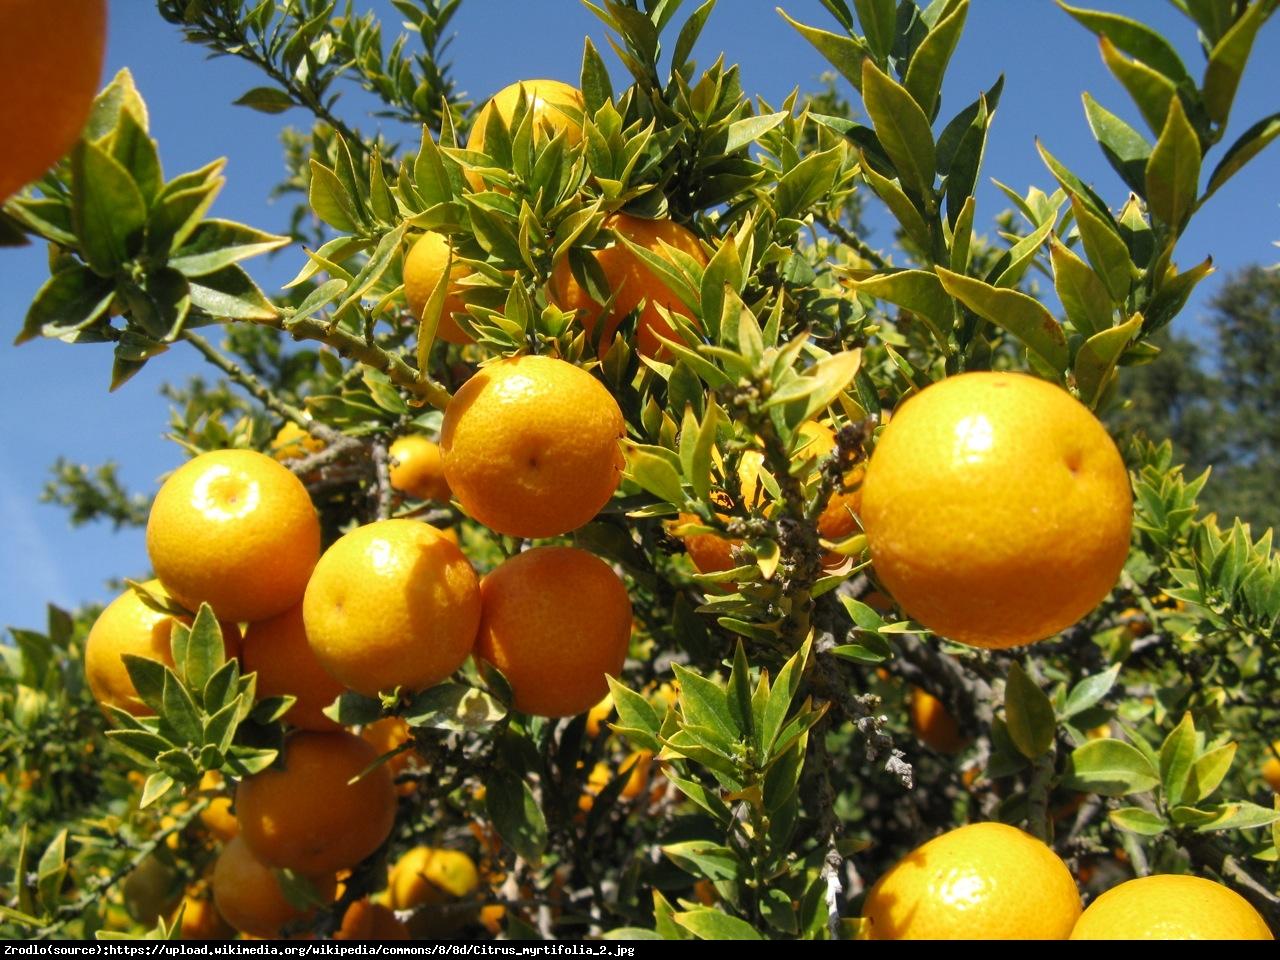 Pomarancza Sycylijska Chinotto  drzewko - Citrus Myrtifolia Chinotto